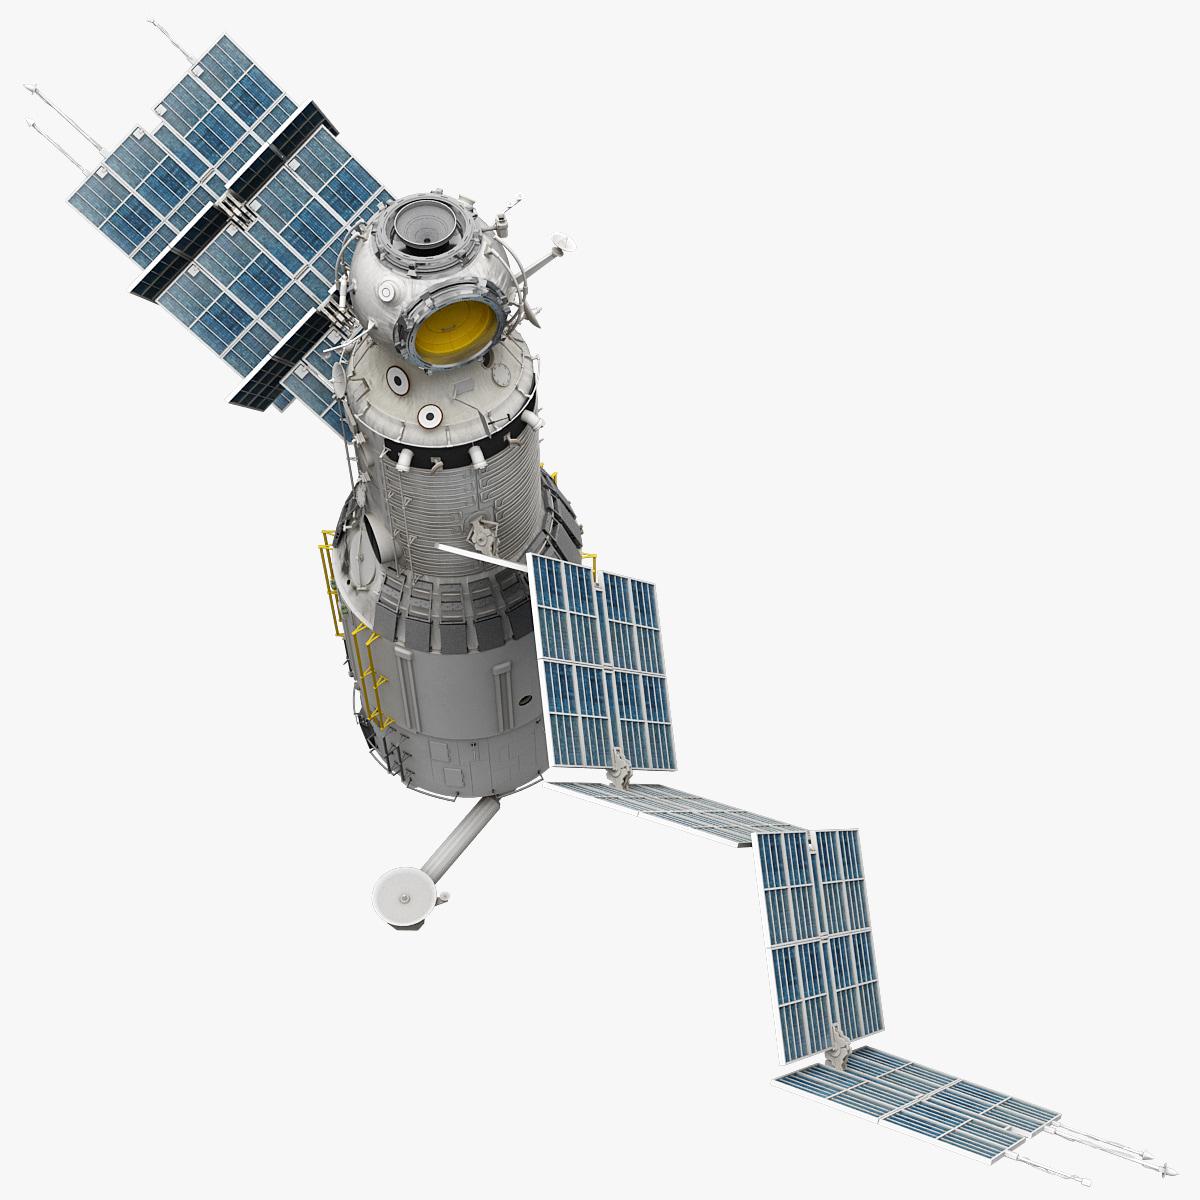 Space_Service_Module_Zvezda_Rigged_0002.jpg